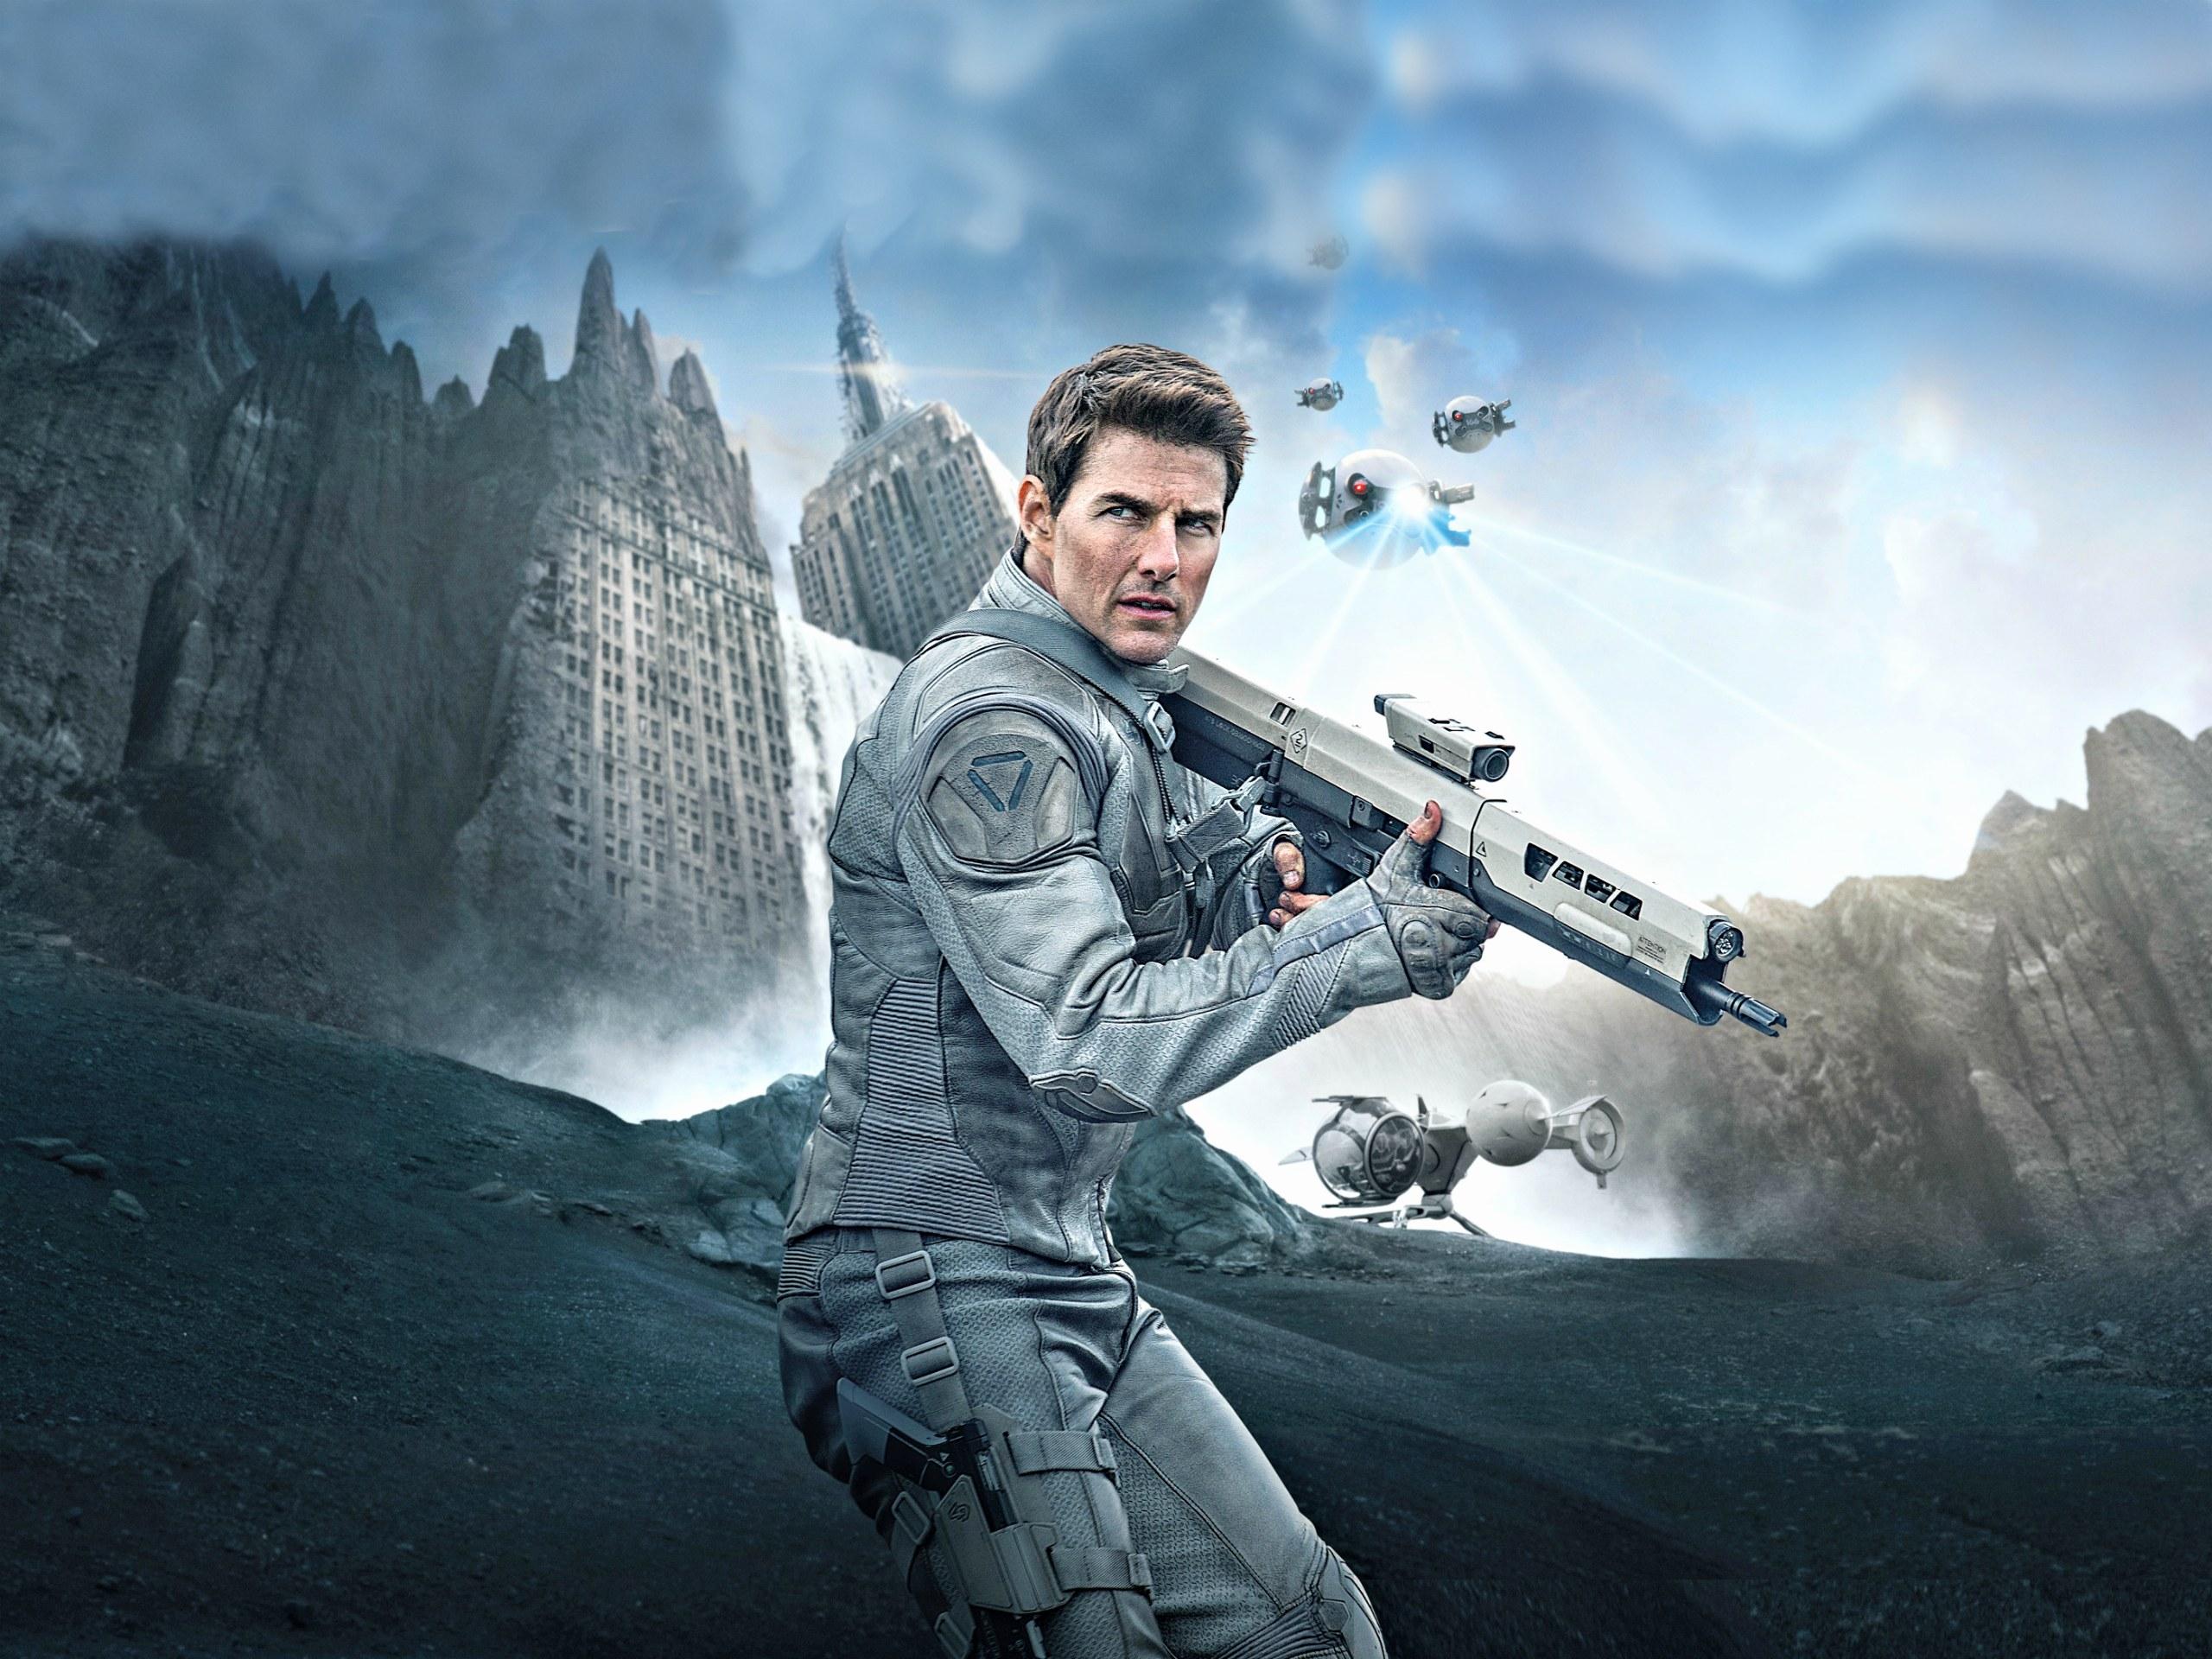 Tom Cruise wallpaper Oblivion   Splendid Wallpaper HD 2560x1920